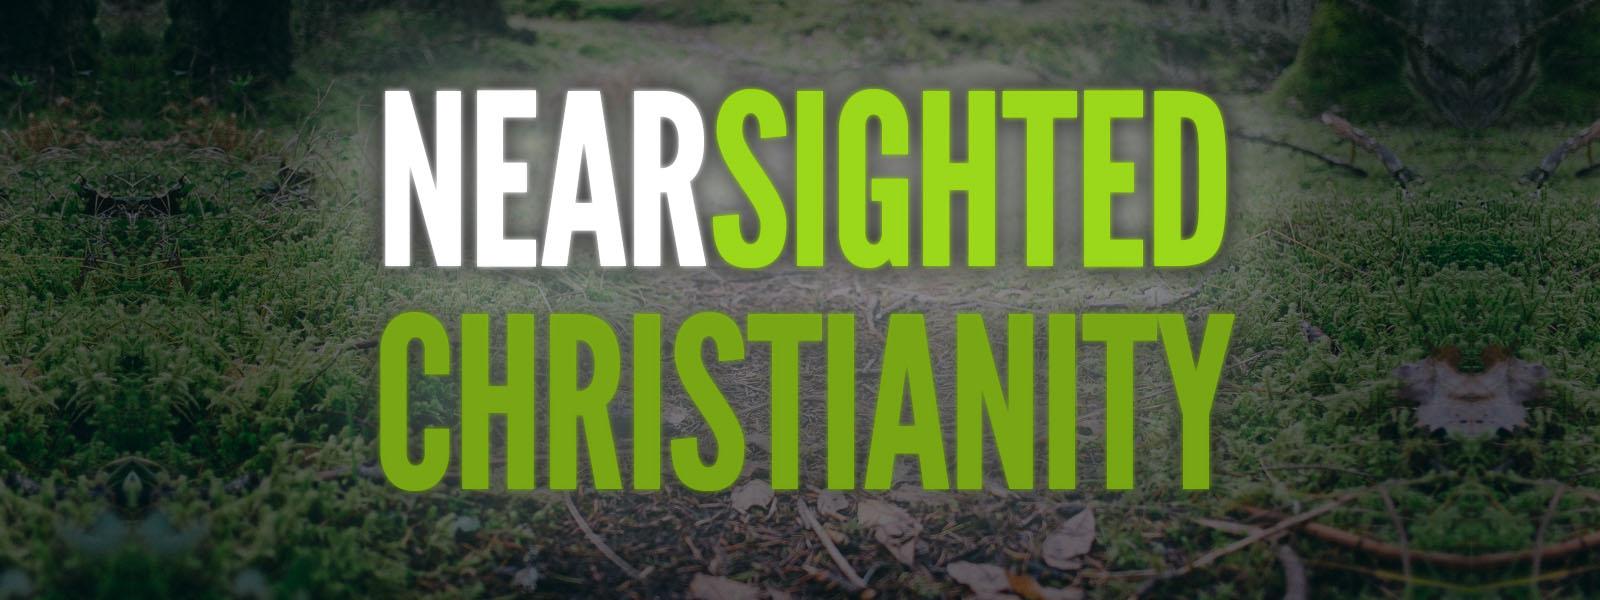 Near-sighted Christianity